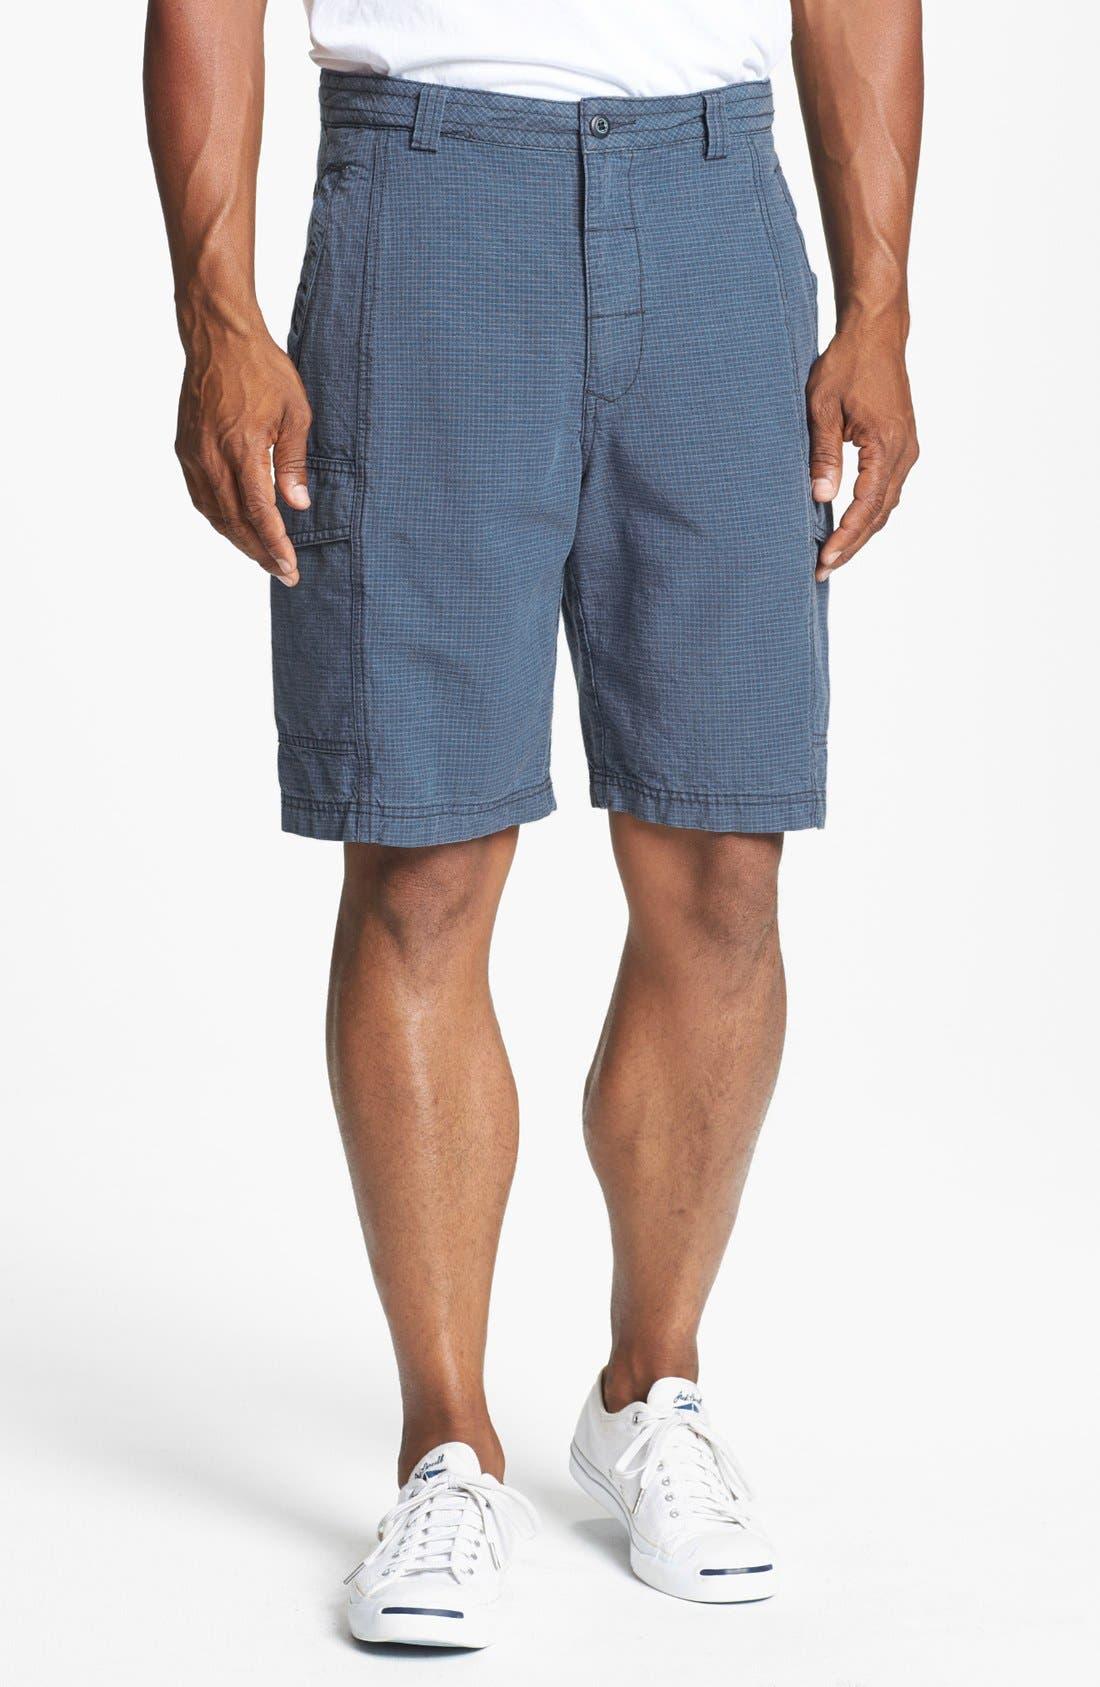 Alternate Image 1 Selected - Tommy Bahama Relax 'Florida Keys Grip' Shorts